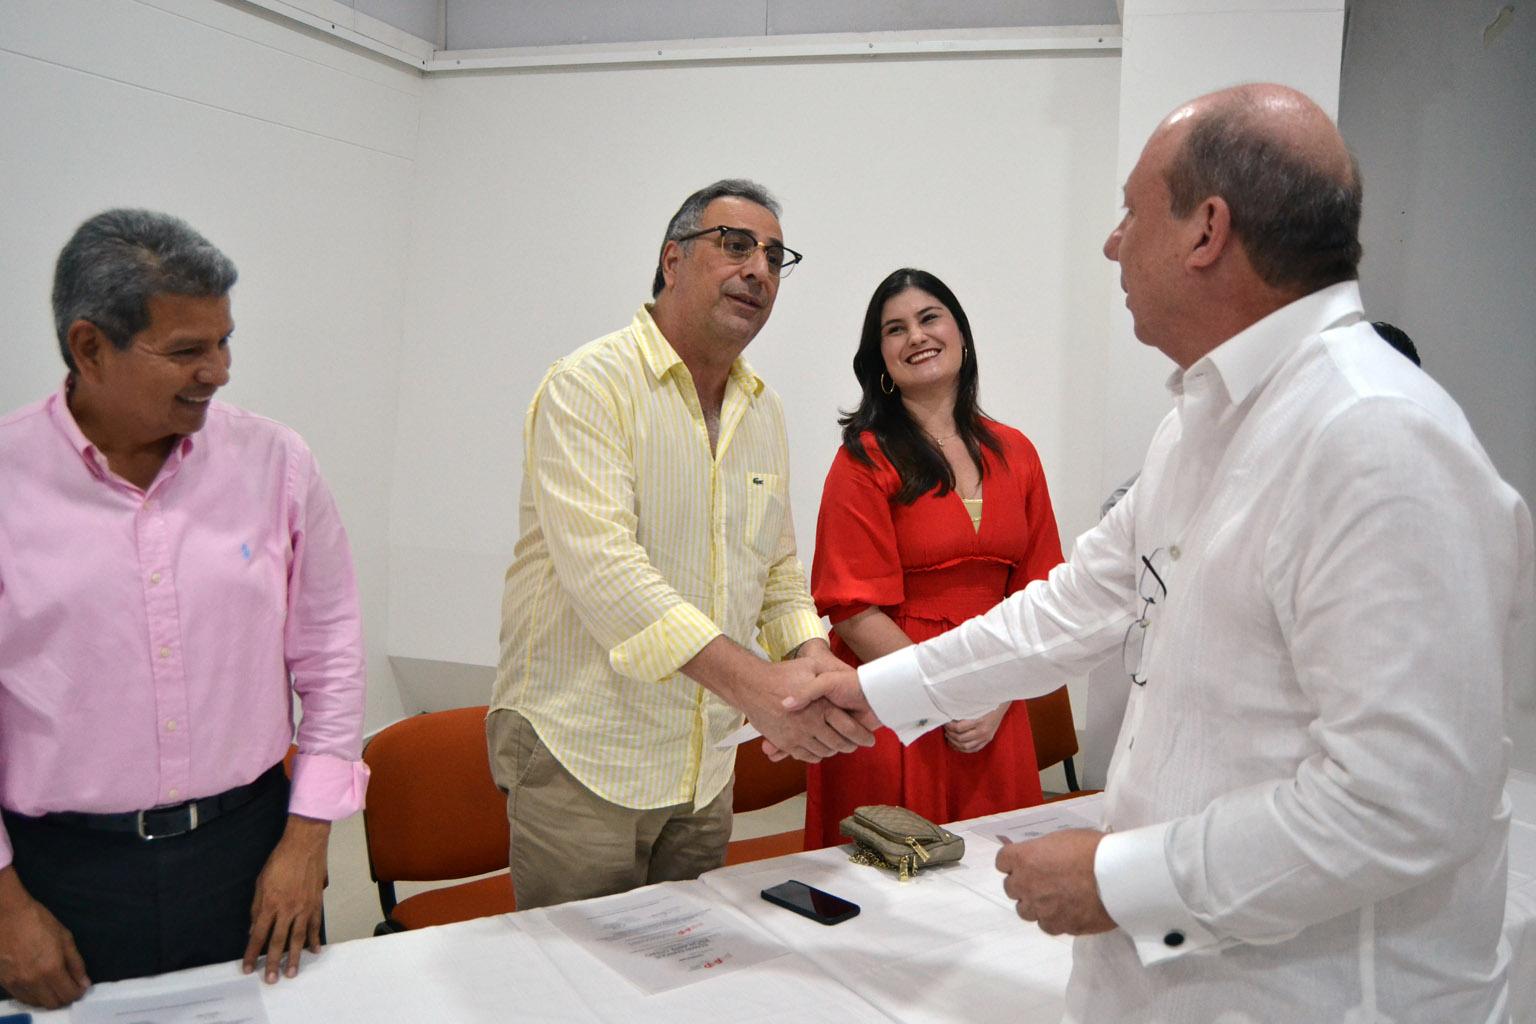 Corporación PEP ganó convocatoria de proyectos de innovación de AtlántiCoCrea